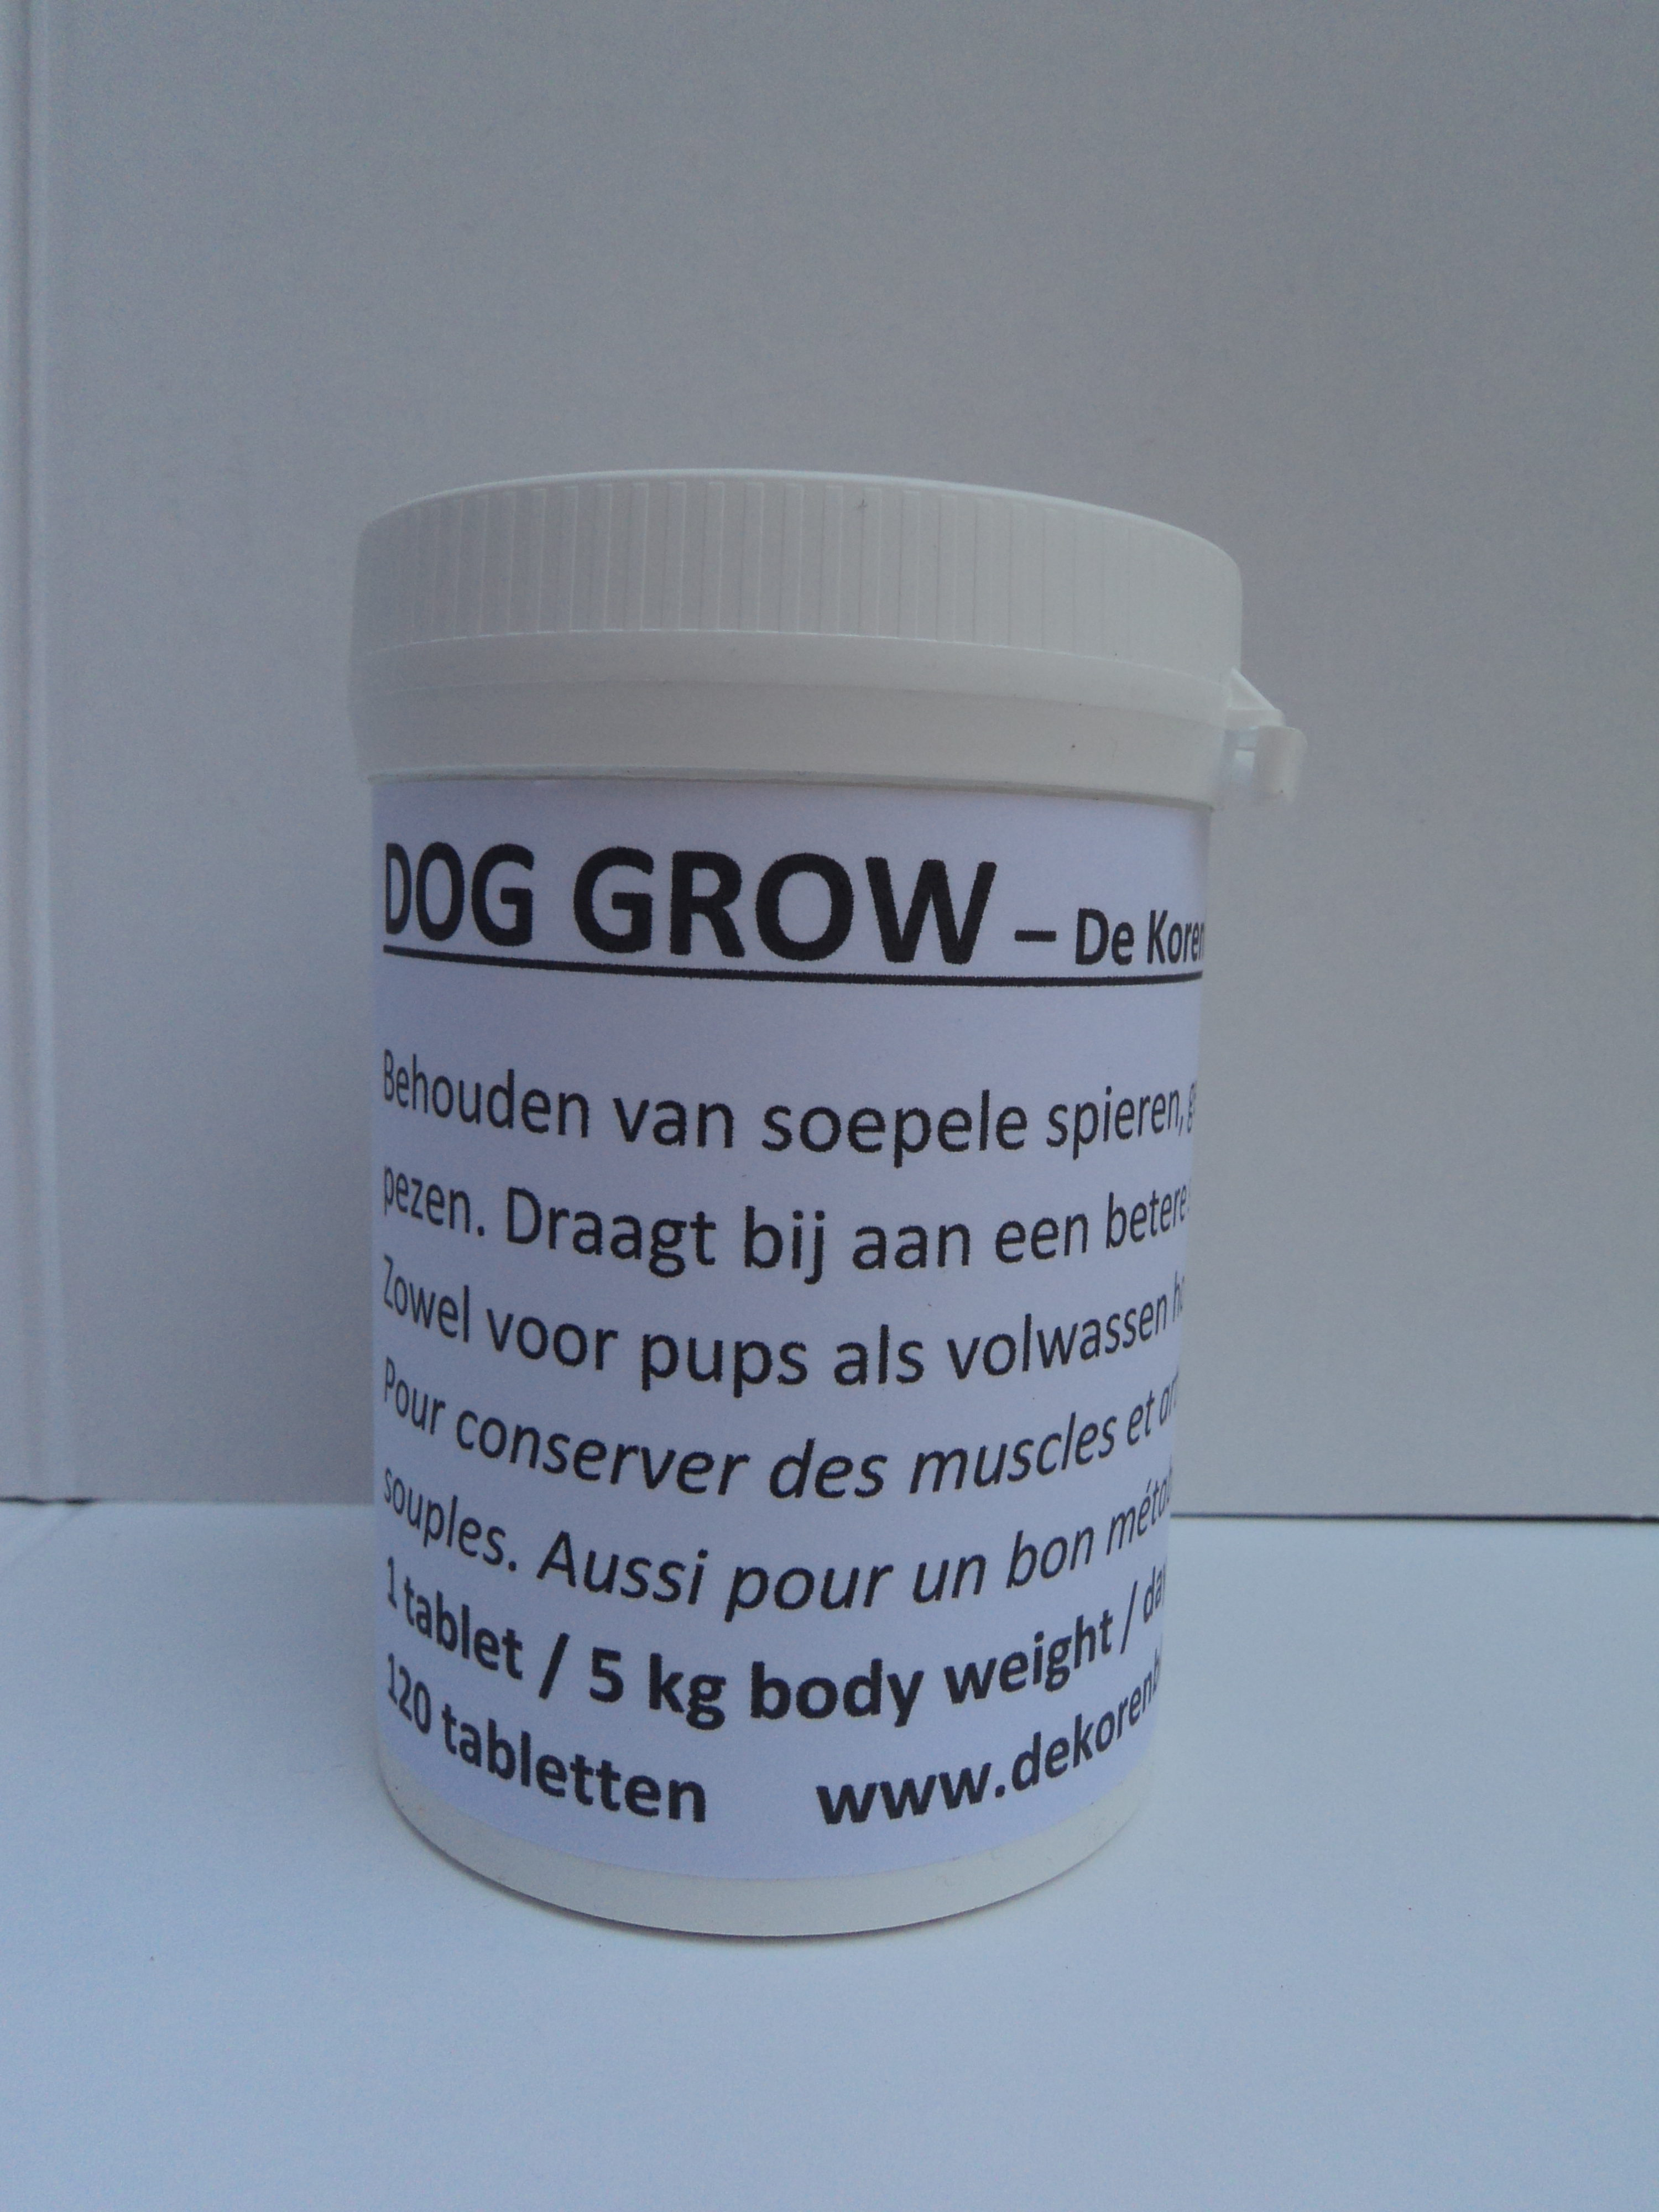 Dog grow, honden